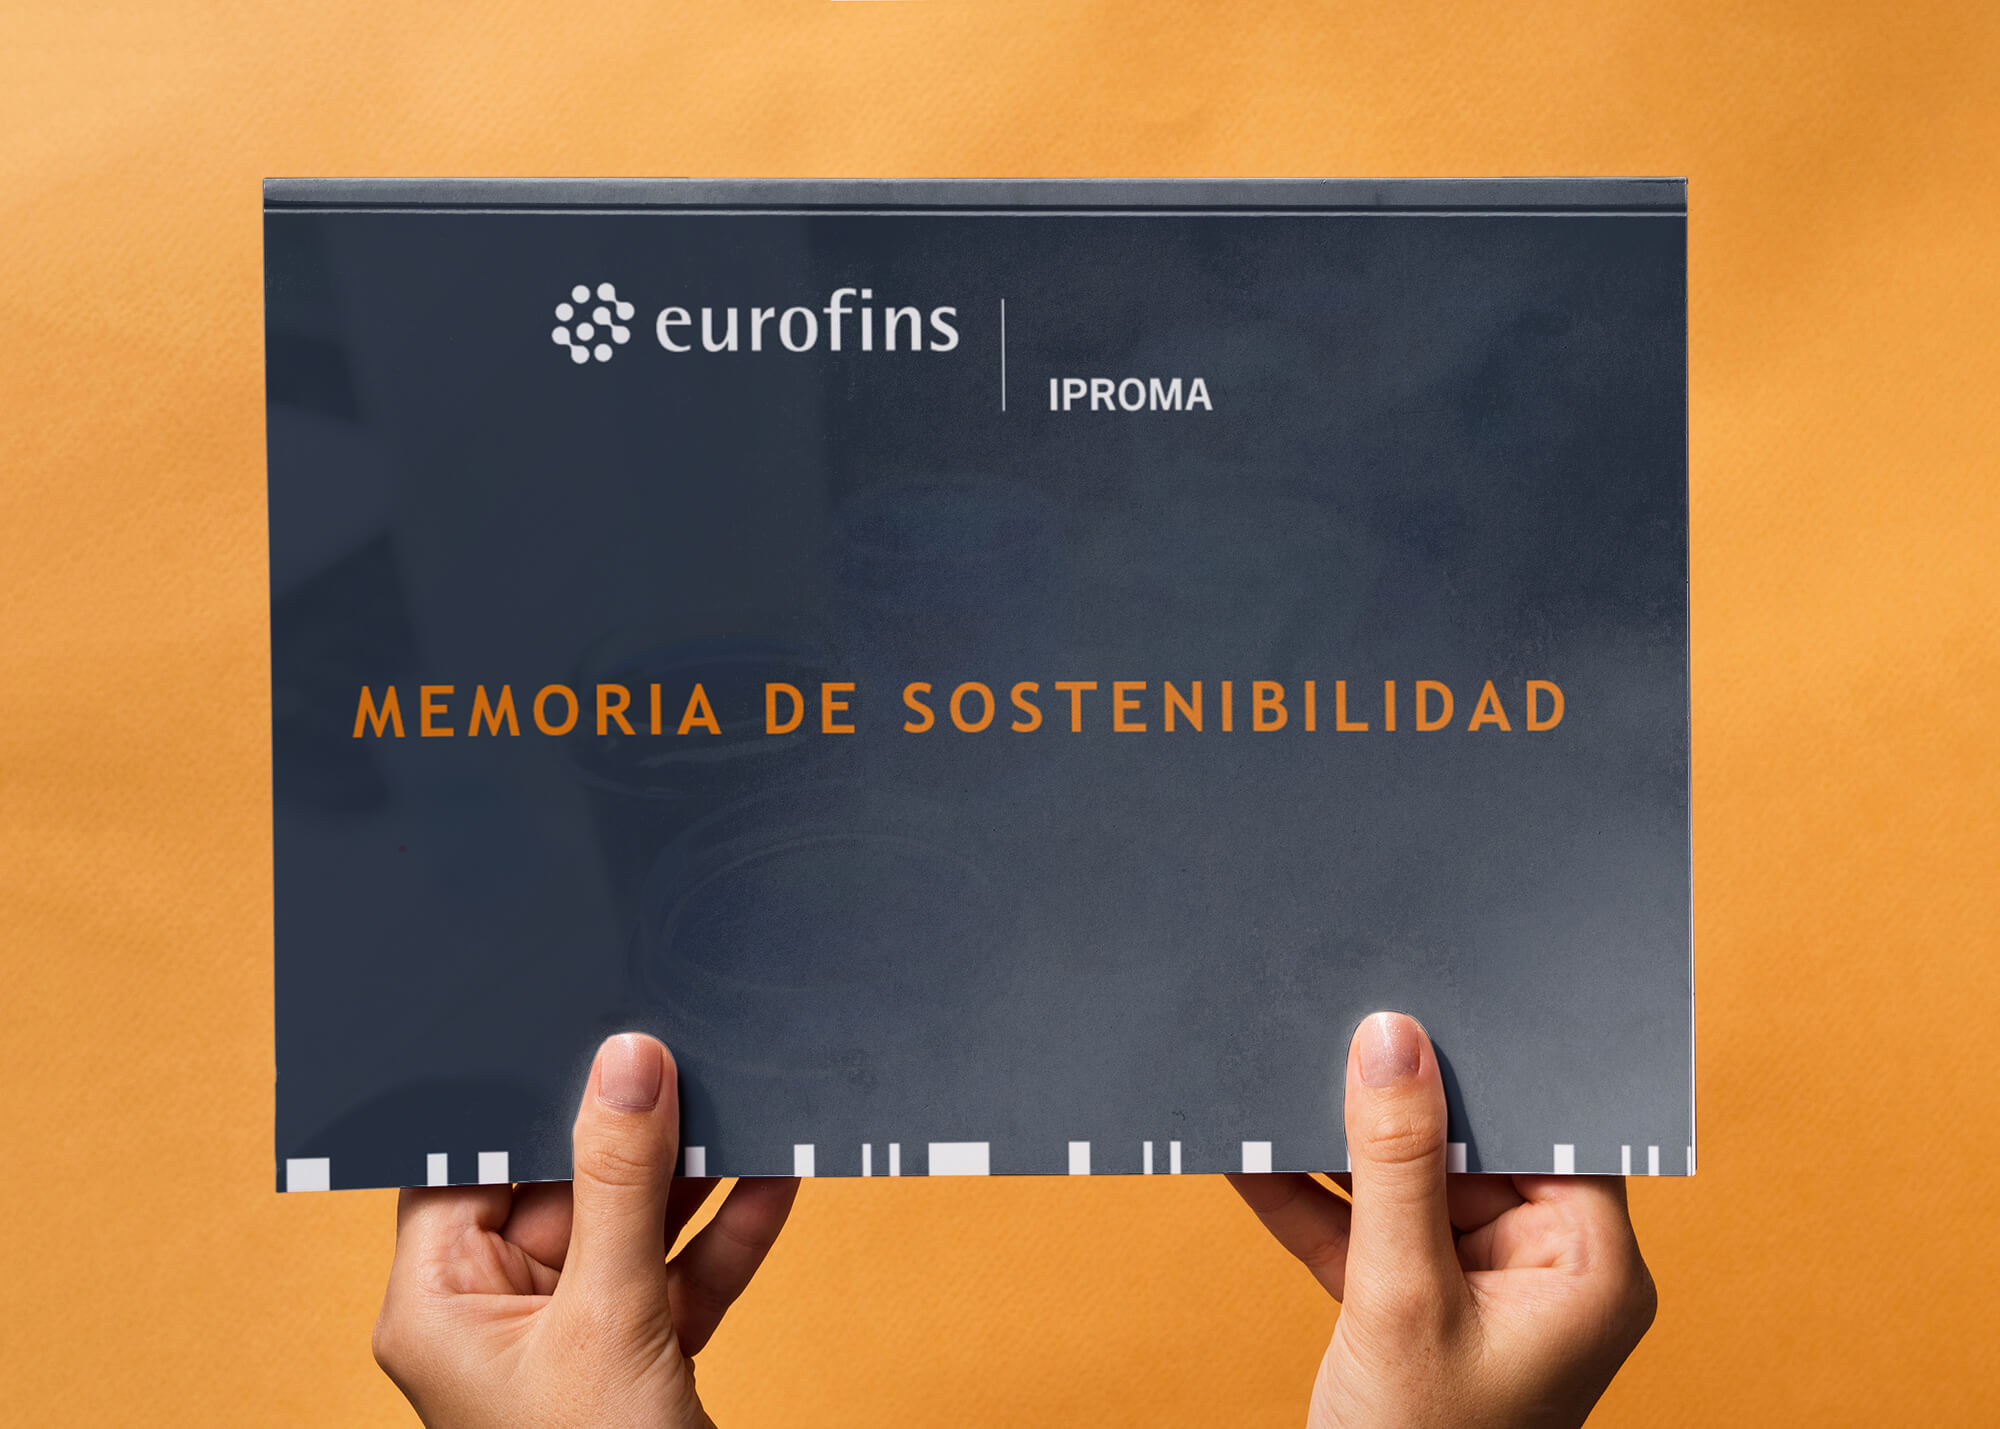 https://www.iproma.com/es/eurofins-iproma-publica-su-segunda-memoria-de-sostenibilidad/